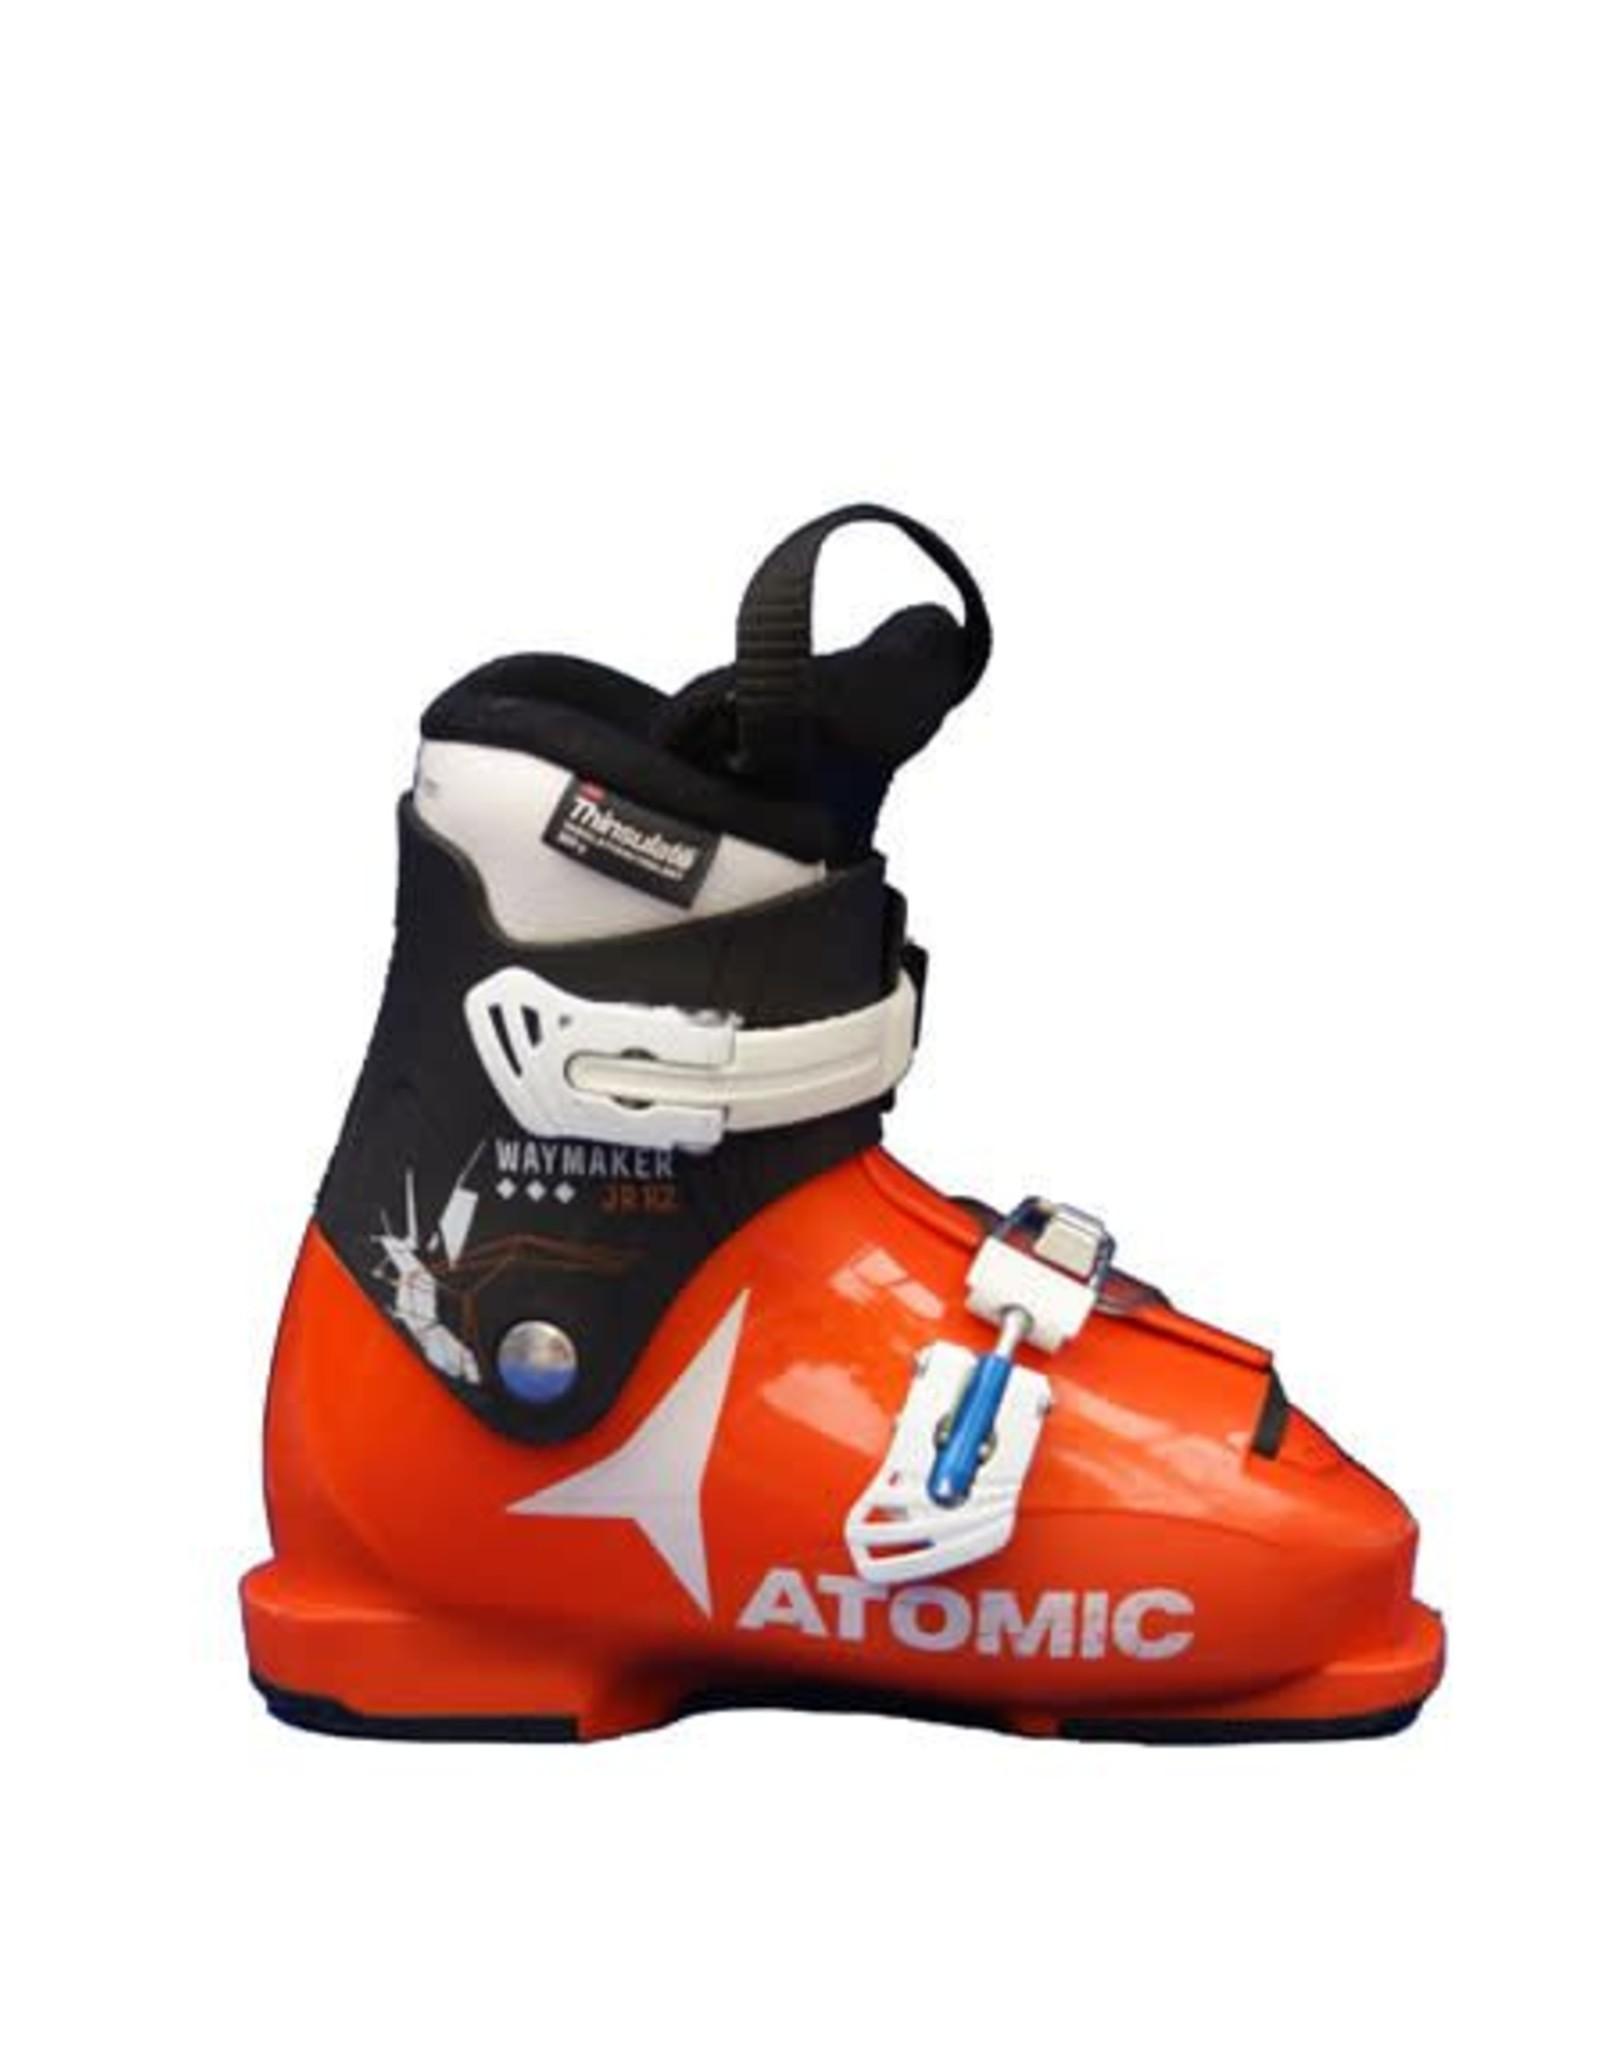 ATOMIC Skischoenen ATOMIC Waymaker JR R2 Oranje Gebruikt